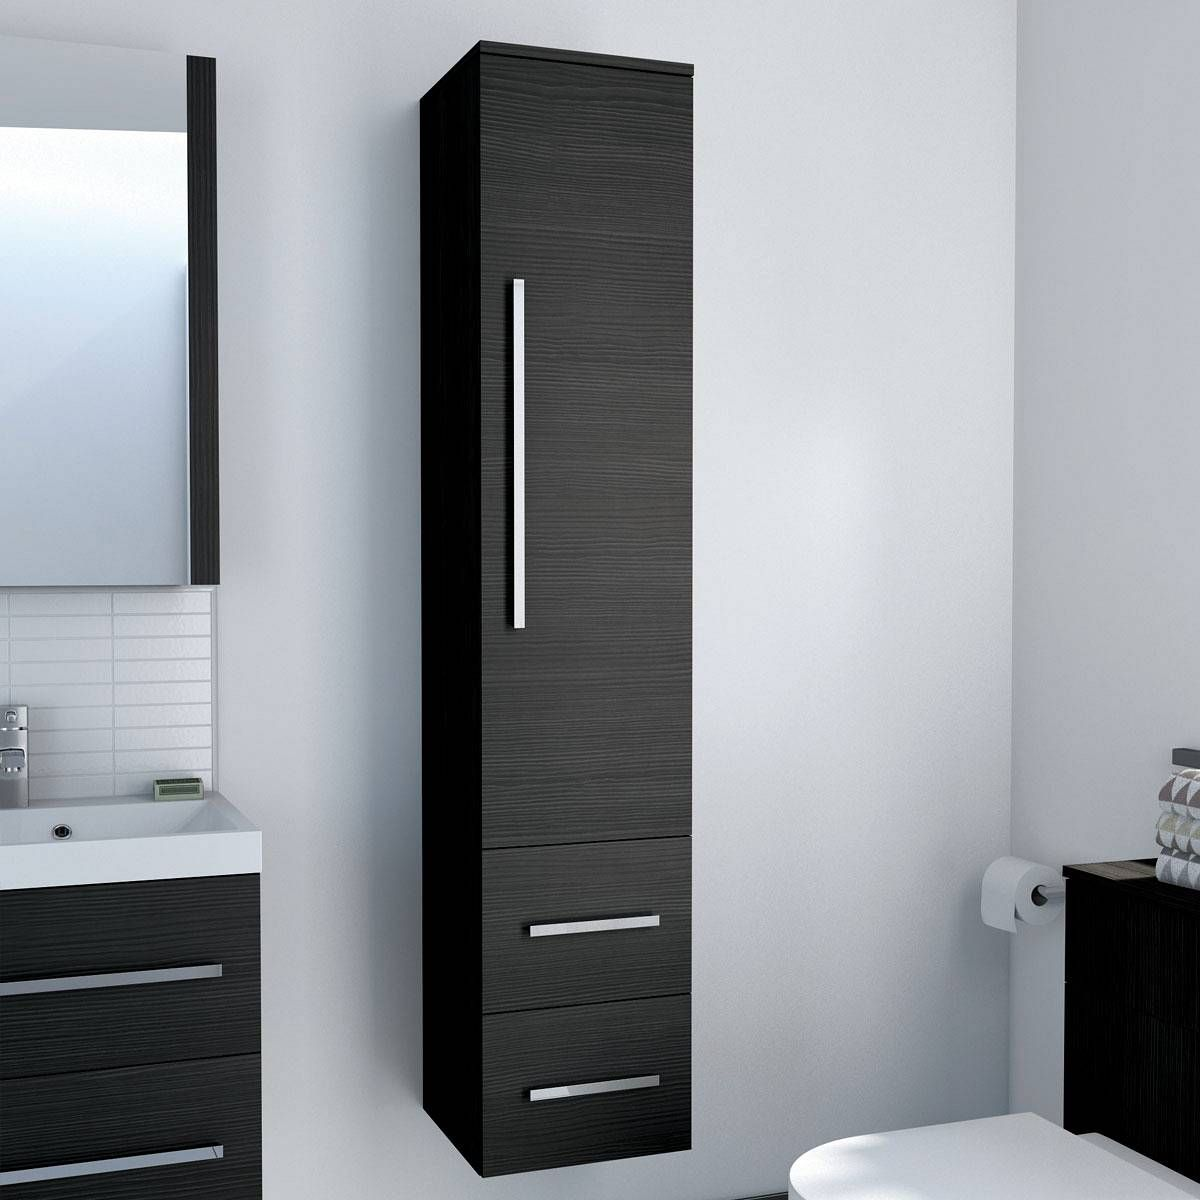 Tall bathroom storage cabinets - Drift Grey Tall Cabinet Now 185 99 Http Www Victoriaplumb